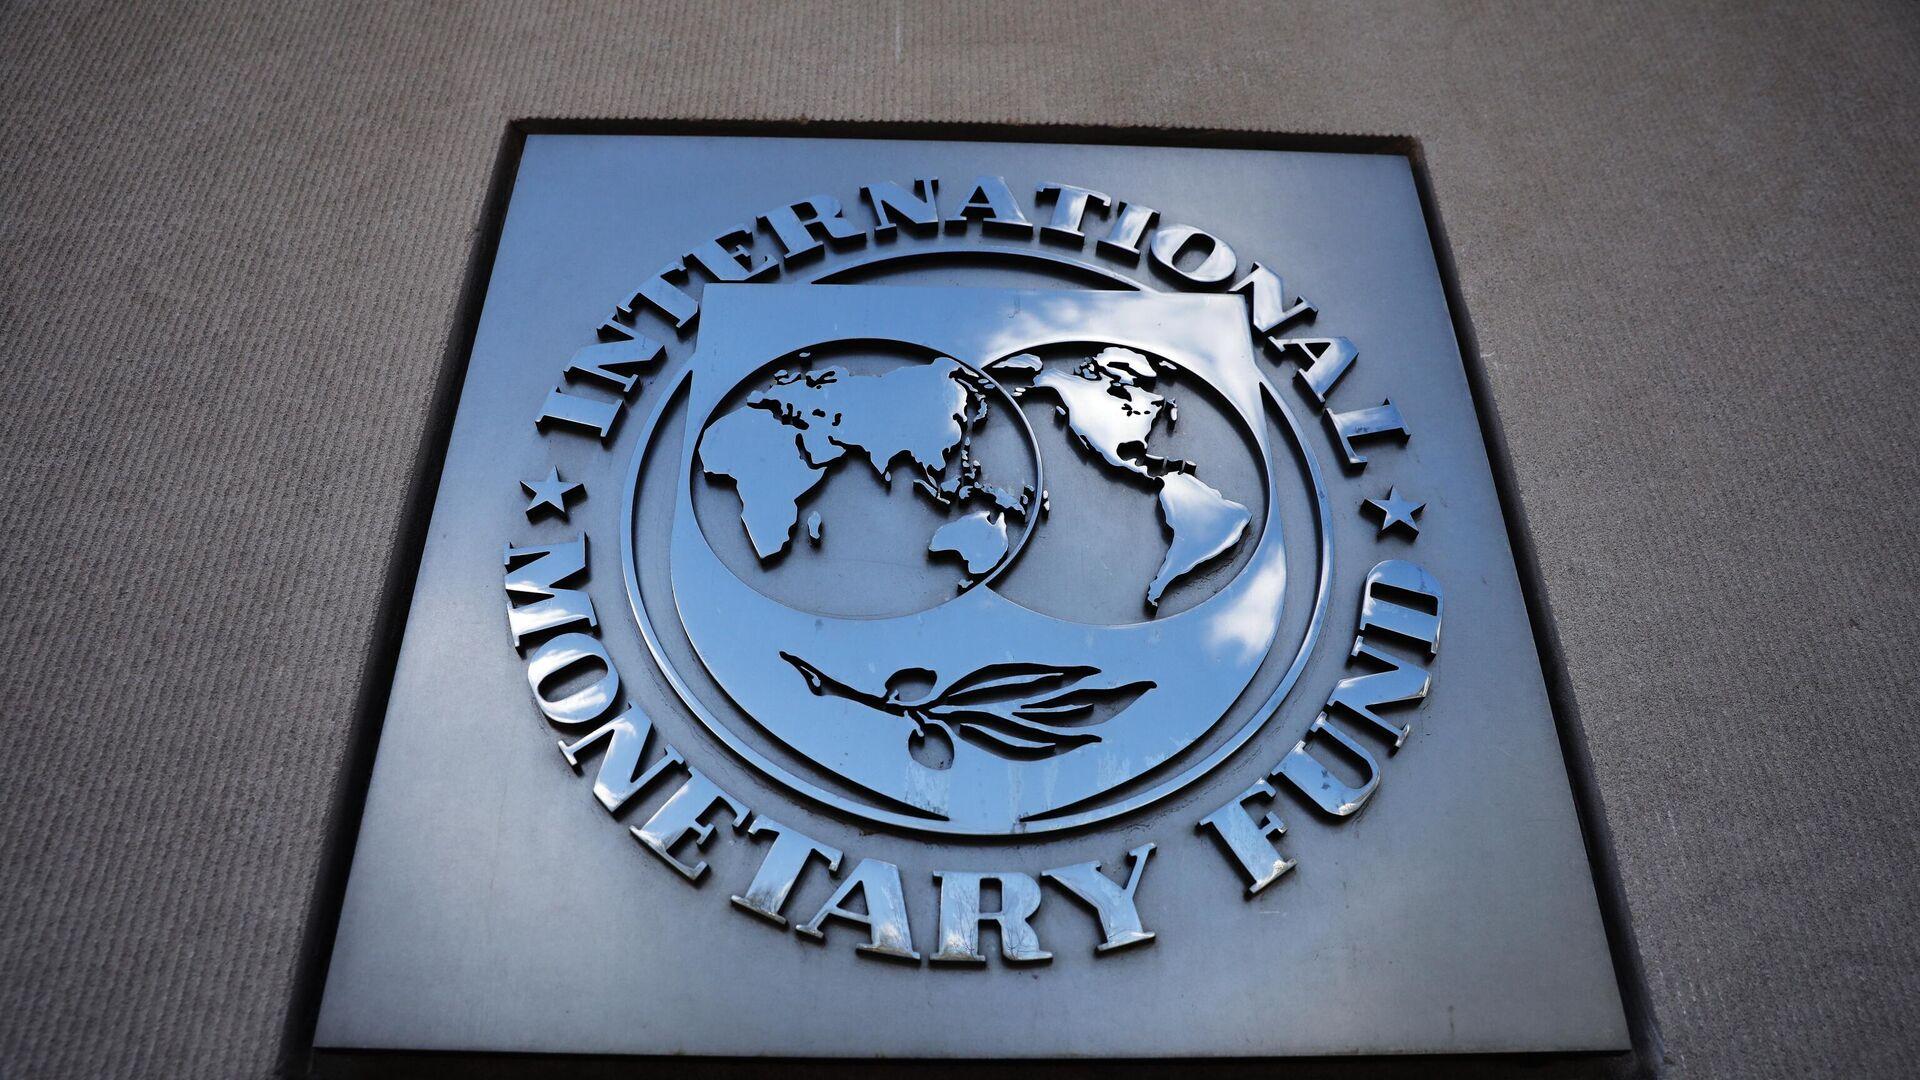 Табличка с логотипом Международного валютного фонда на стене здания МВФ. - Sputnik Таджикистан, 1920, 21.09.2021